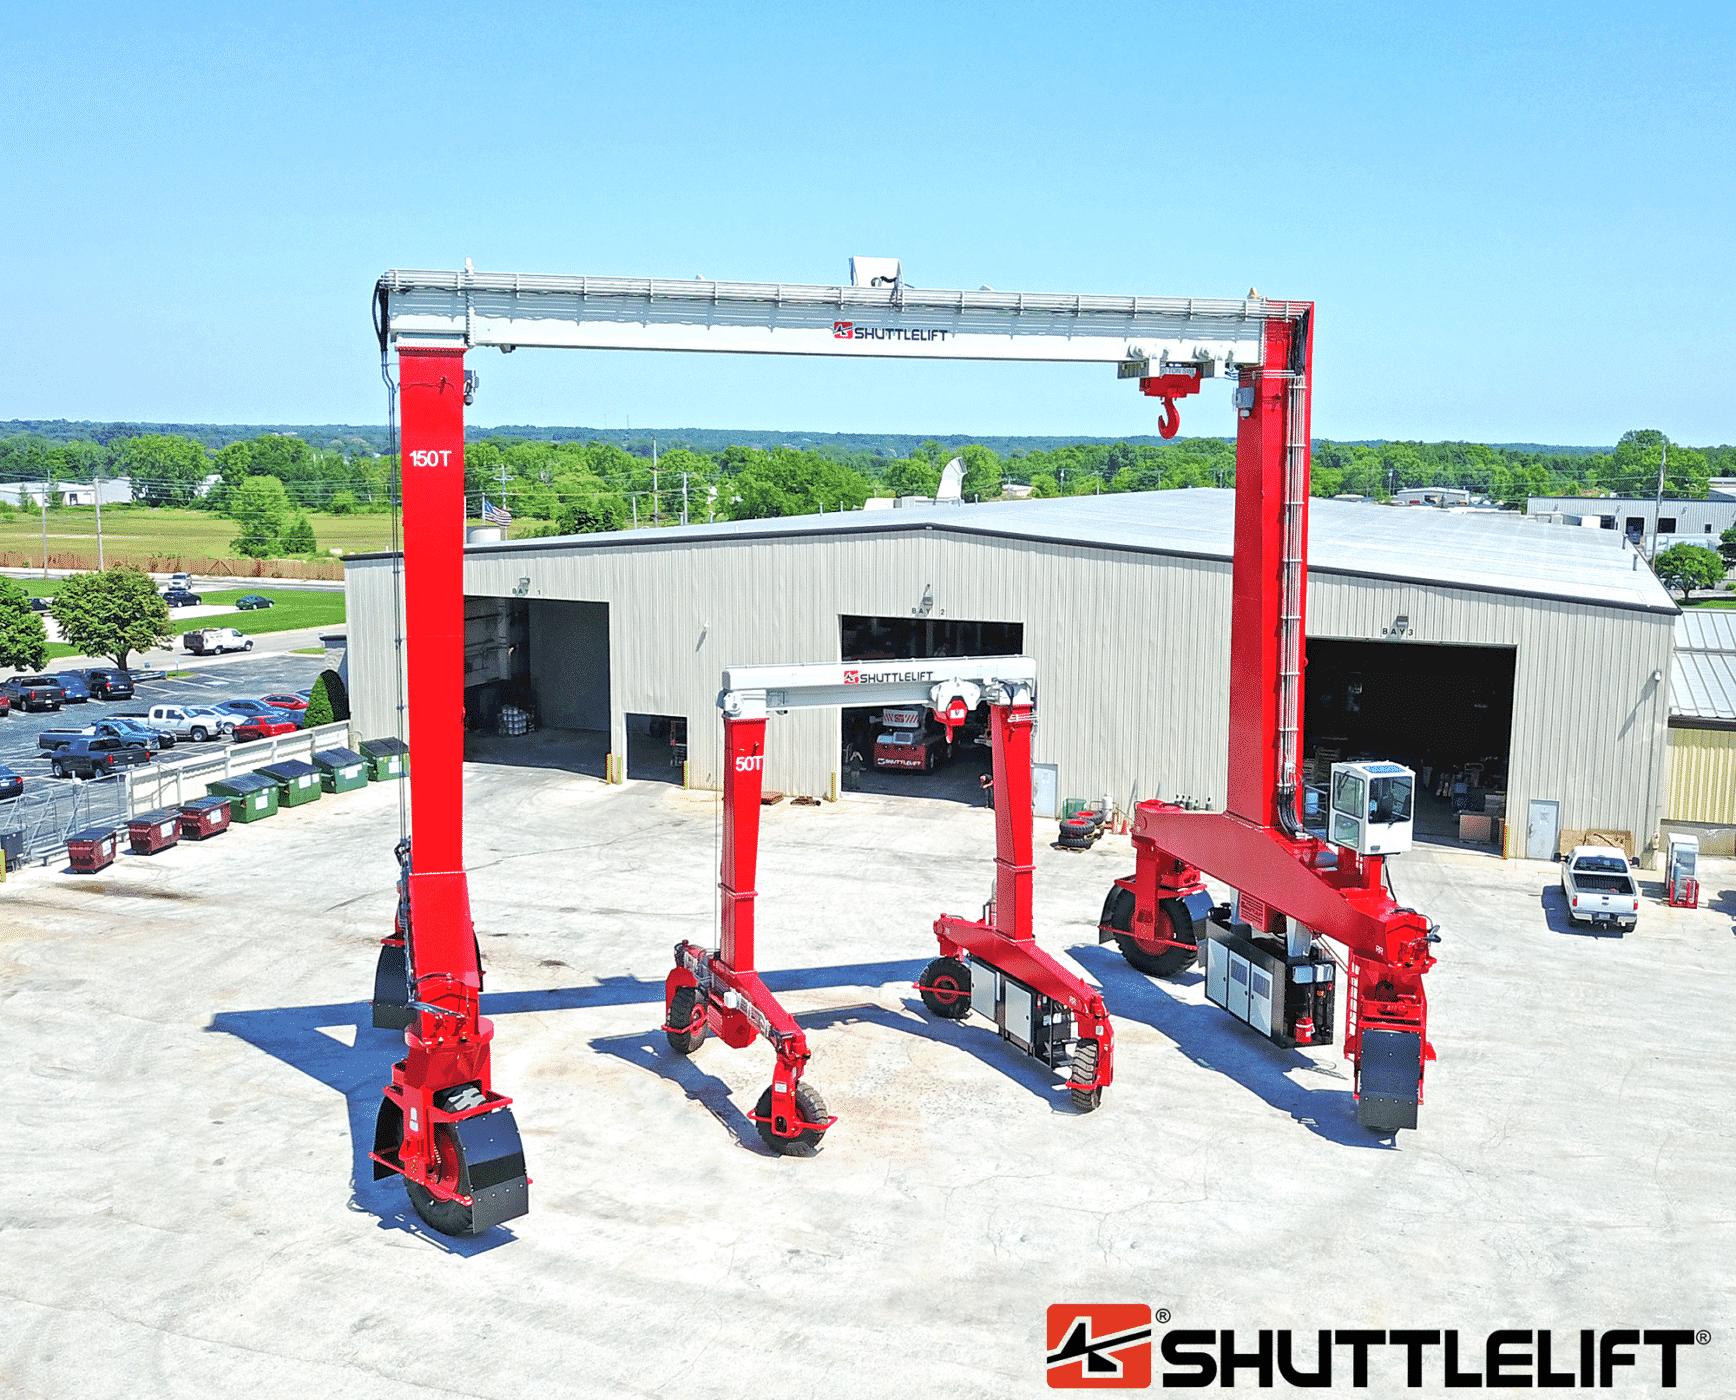 Dual Shuttlelift SB rubber tire gantry cranes